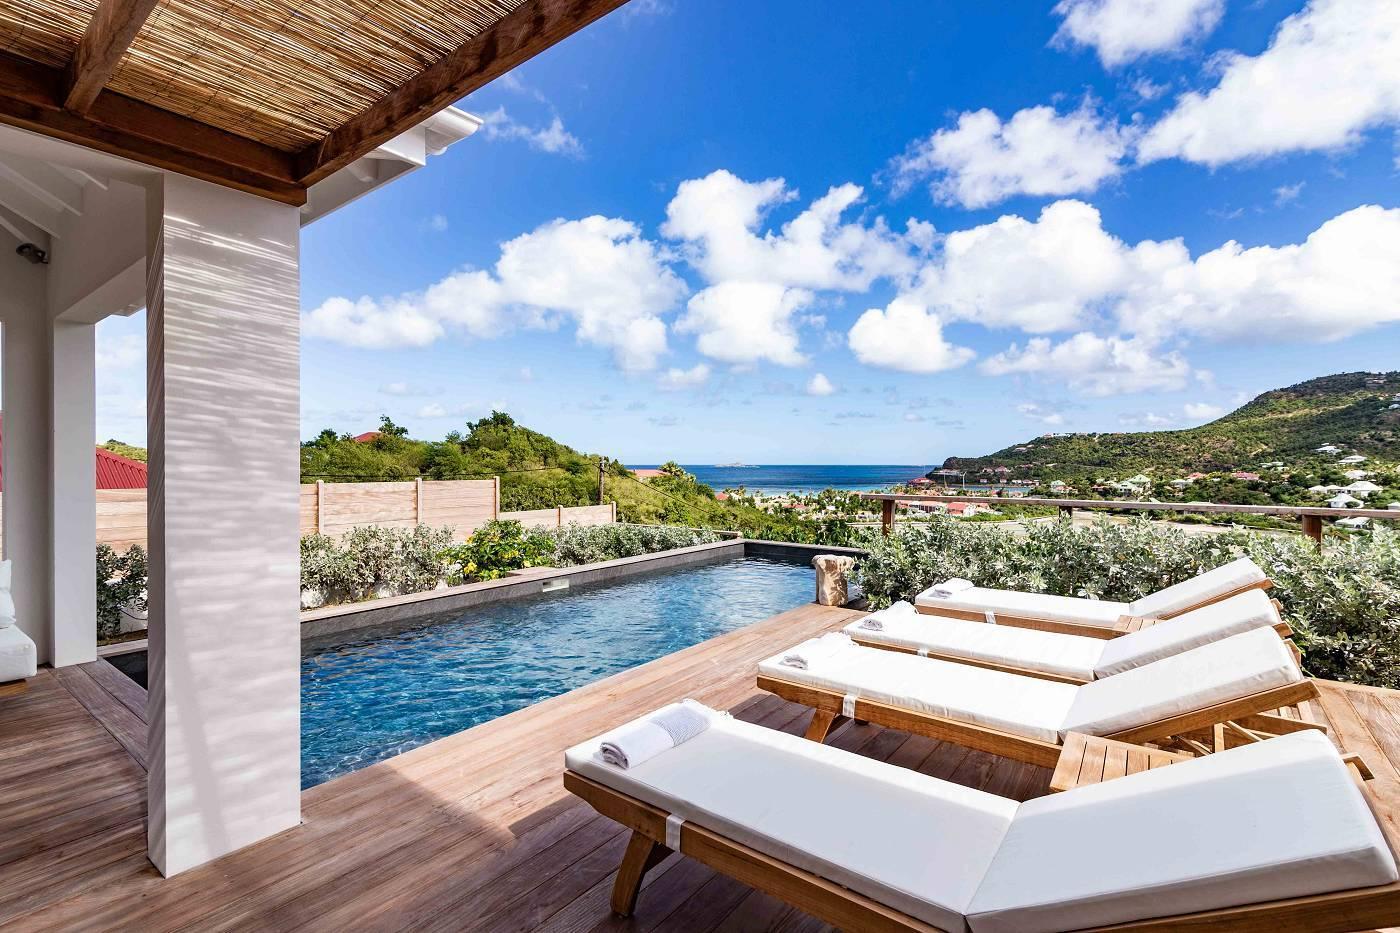 Luxury for Less: 4 St. Barths' Villas We Love